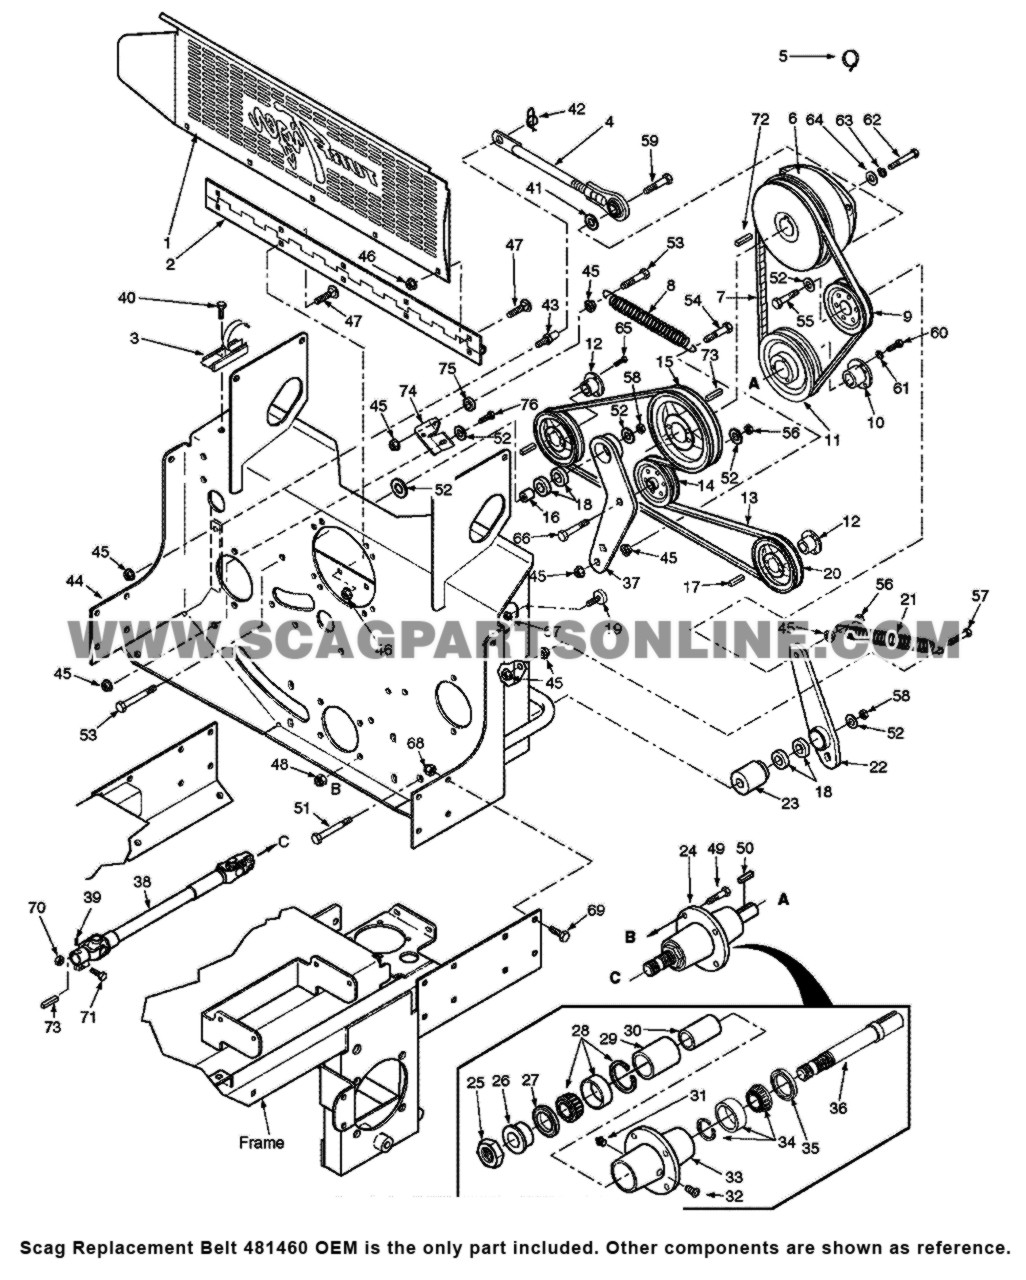 Parts lookup Scag Replacement Belt 481460 OEM diagram